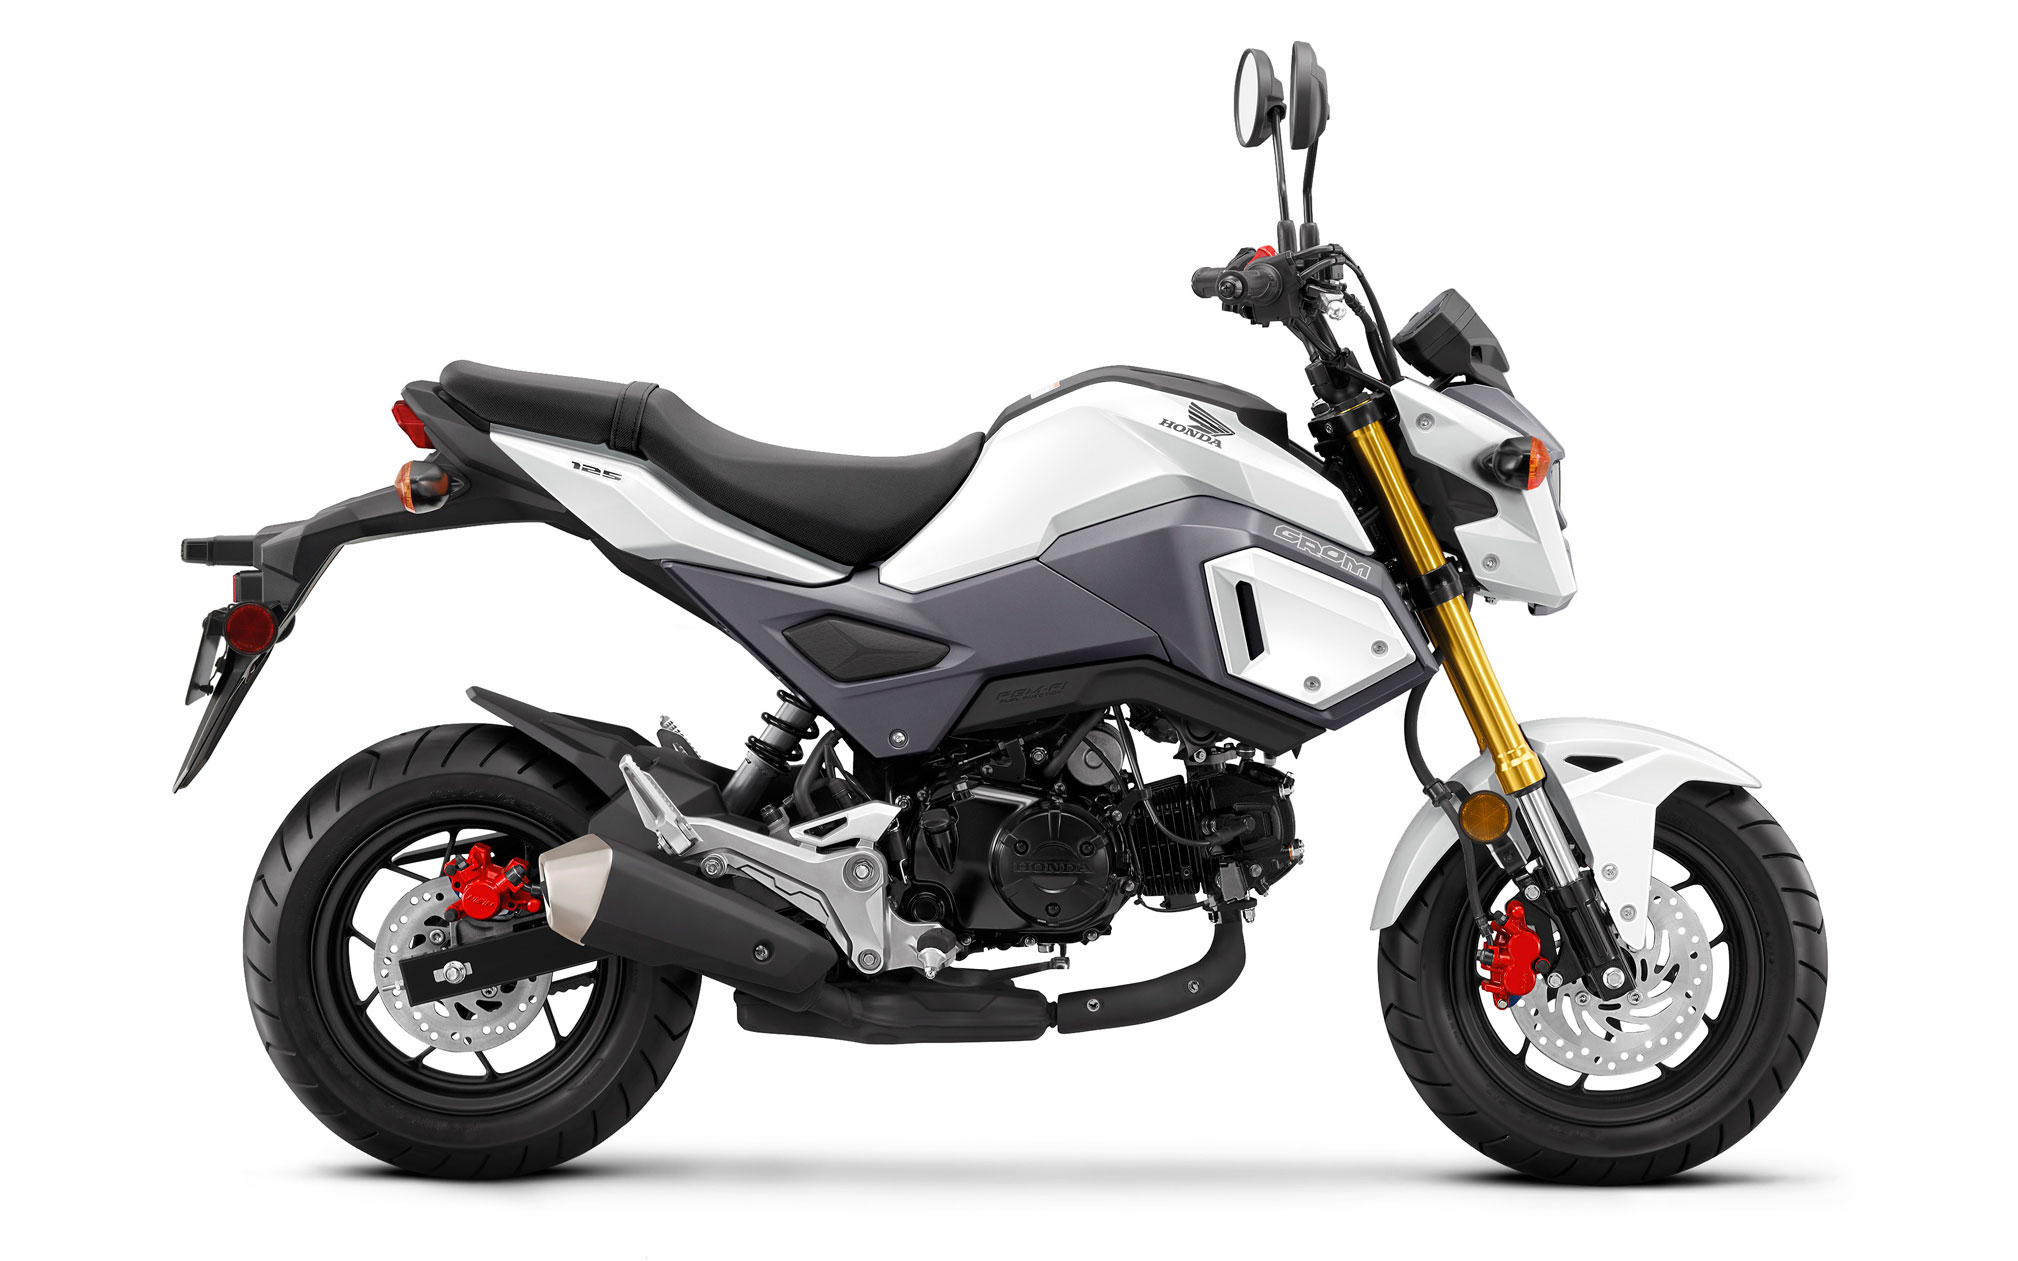 Honda-msx-125-Grom-beyaz